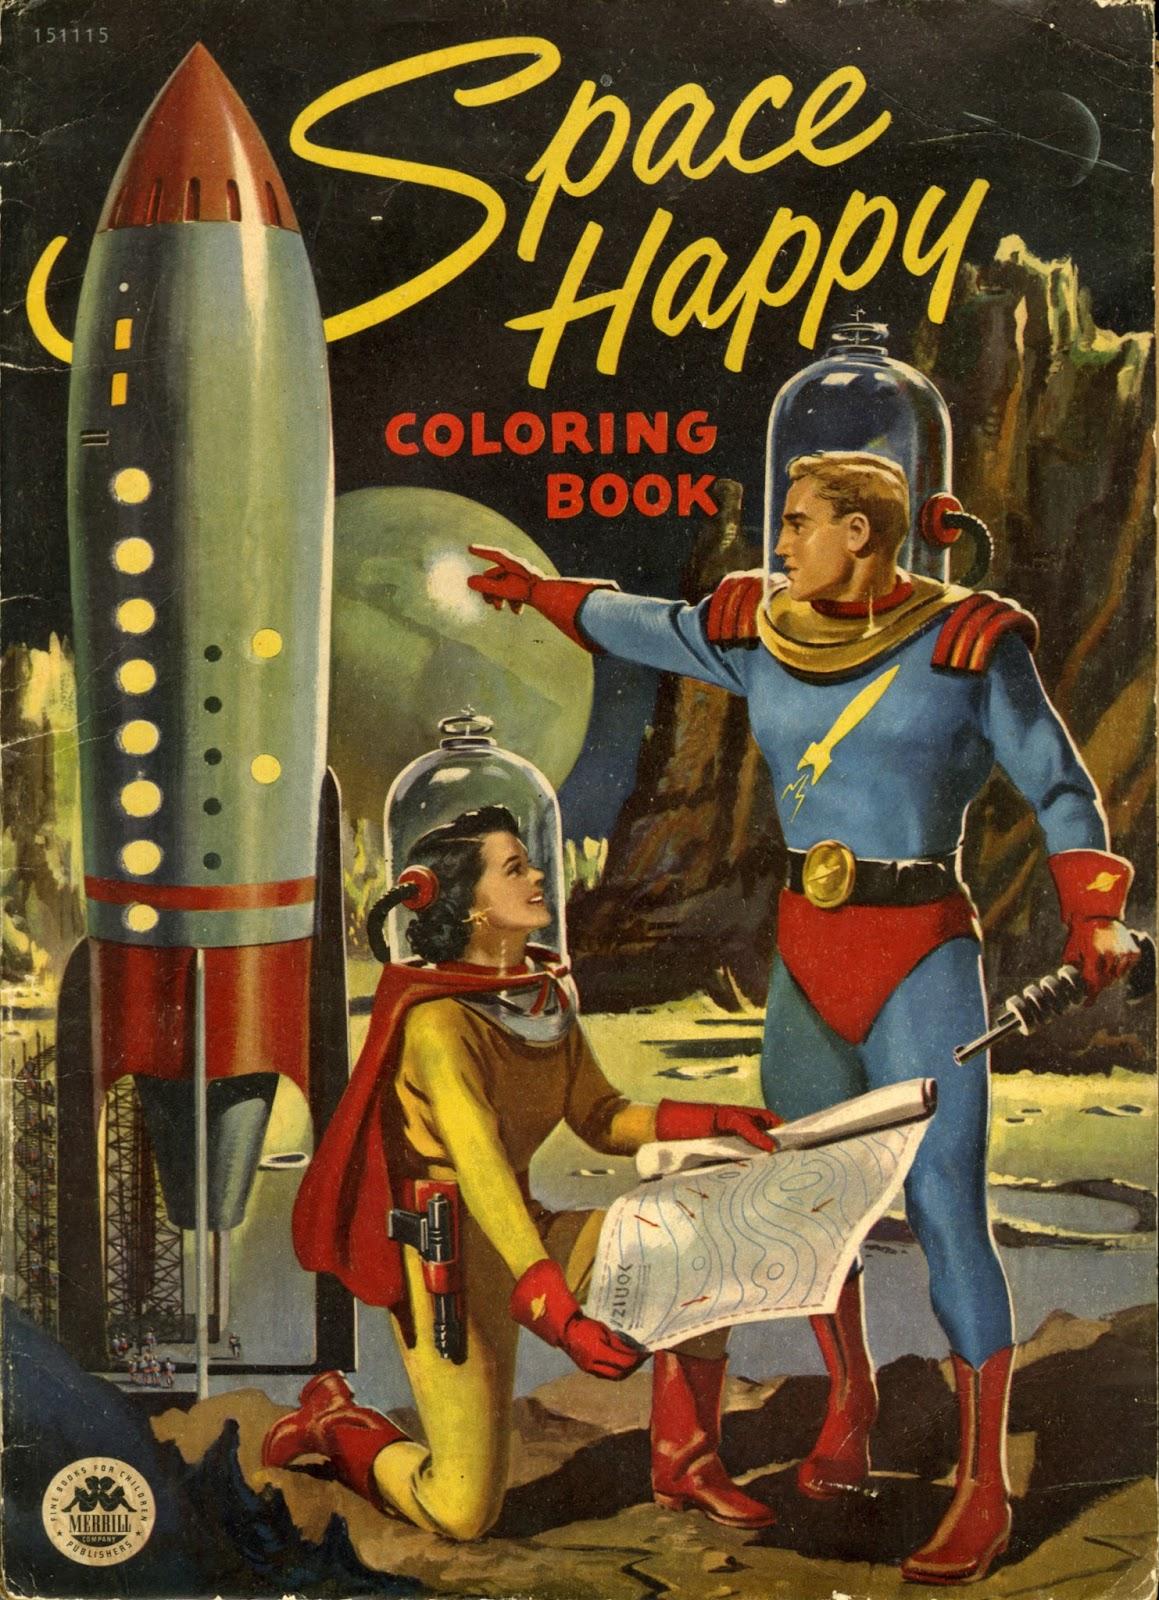 SPACE HAPPY 1953